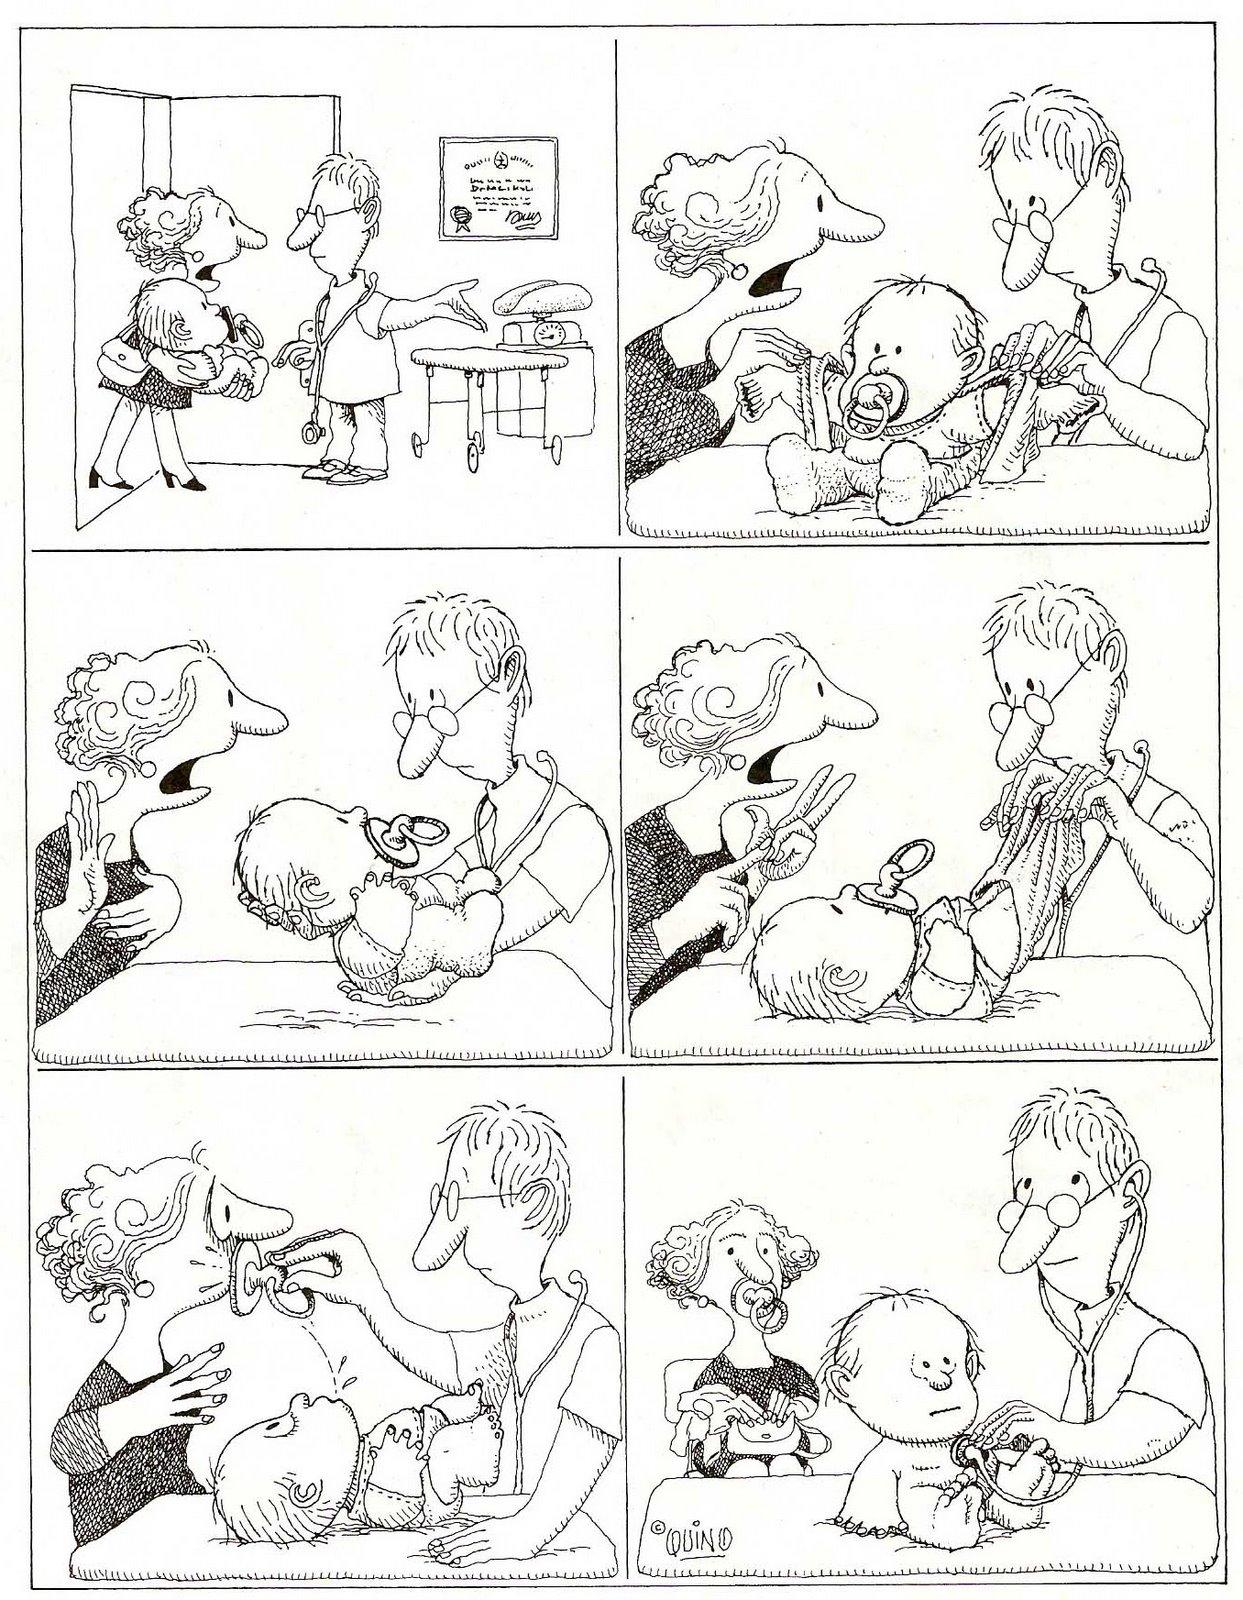 Quino, viñeta muda, pediatra niño y madre